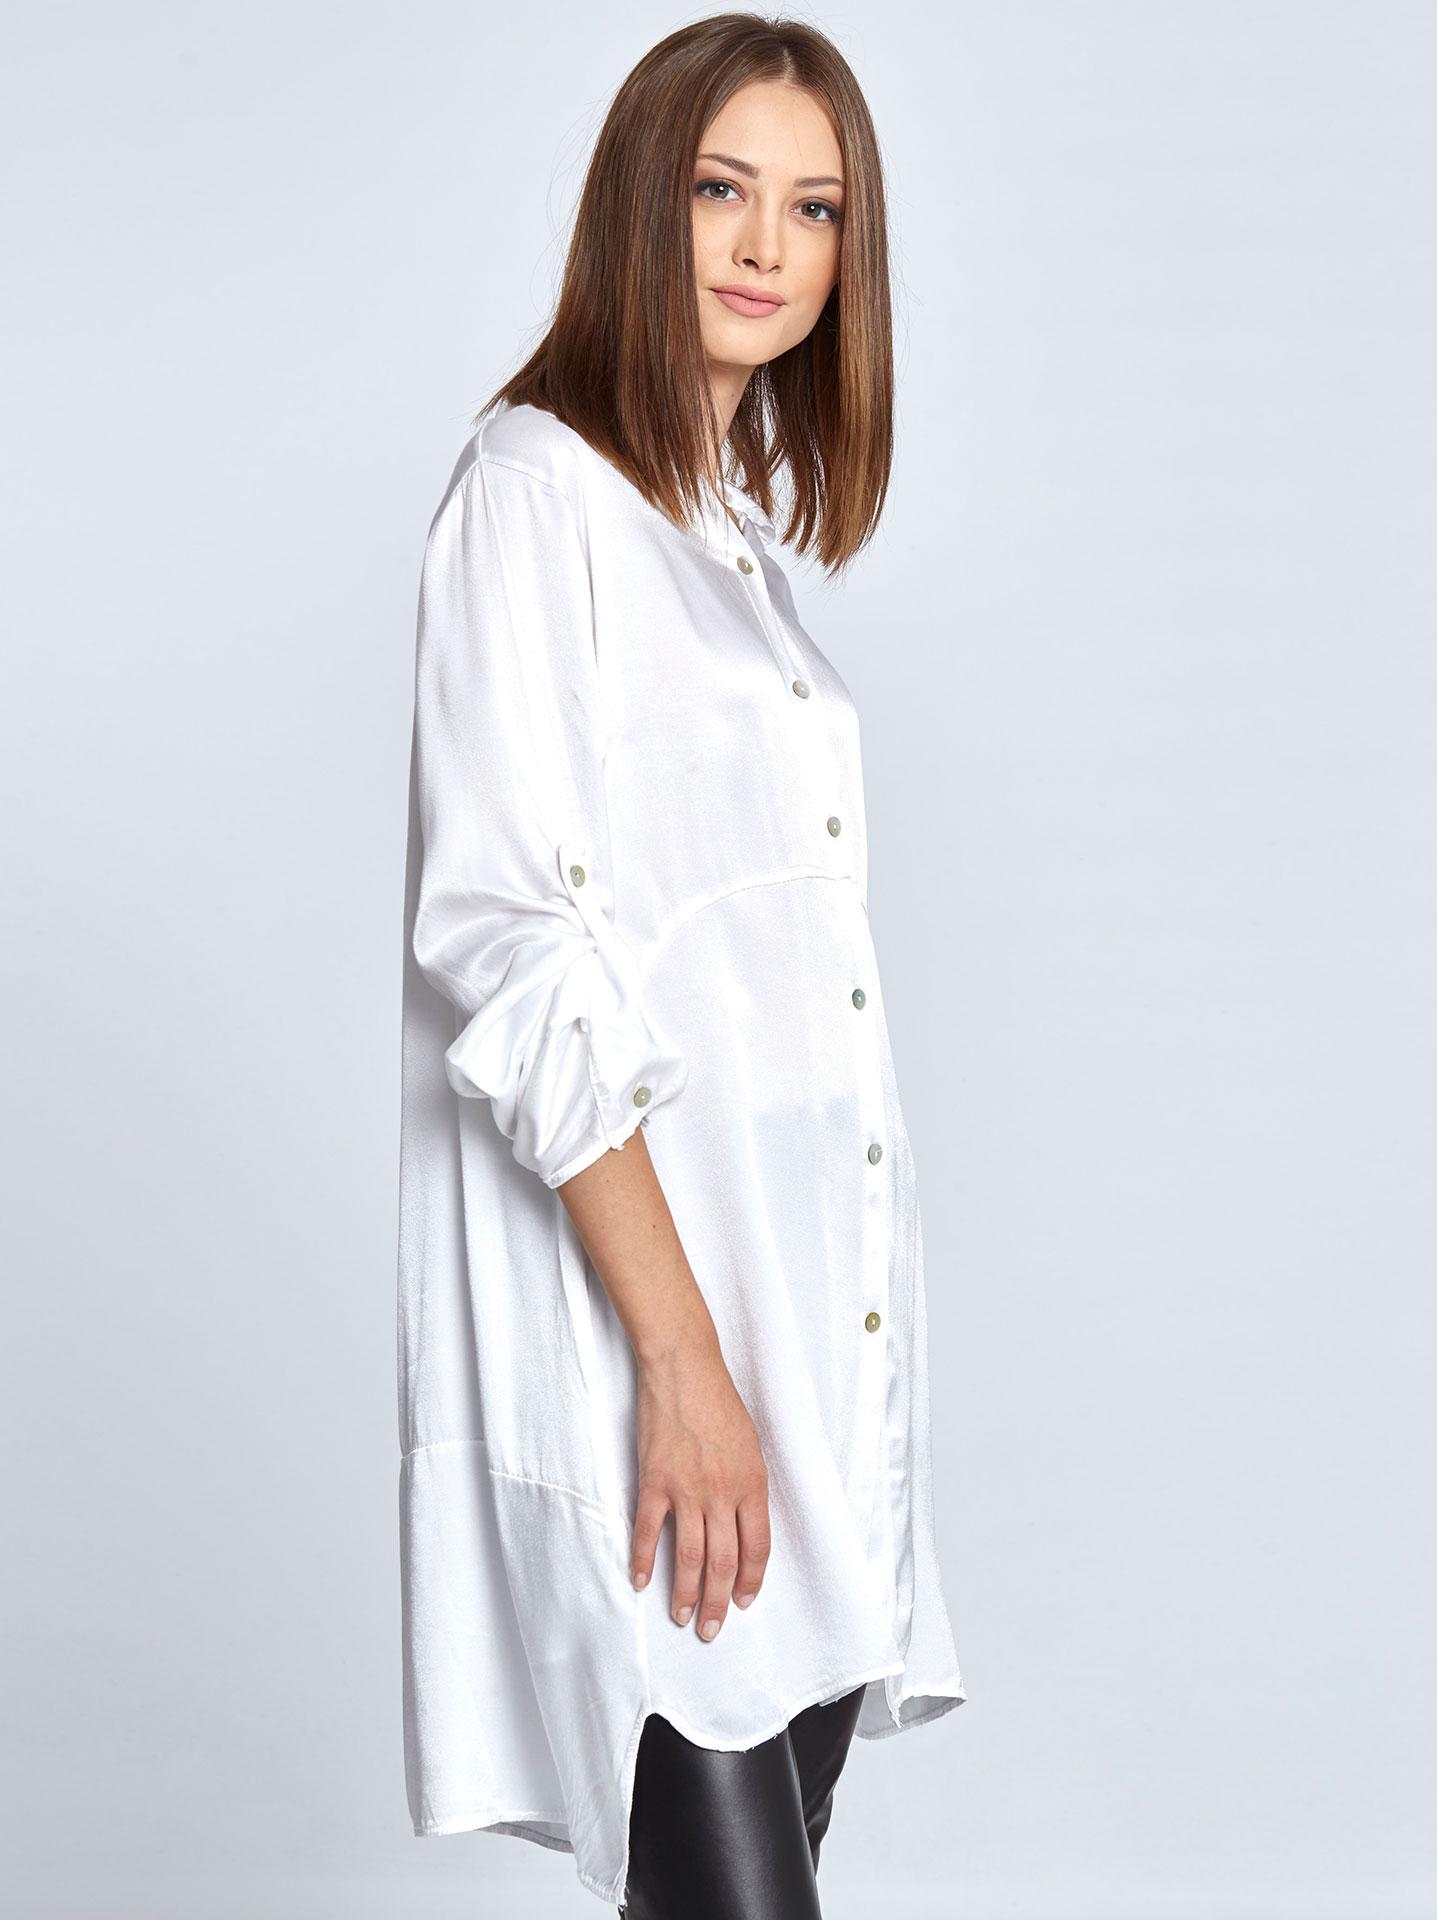 ed36ae9914b Satin-like long sleeve shirt in white